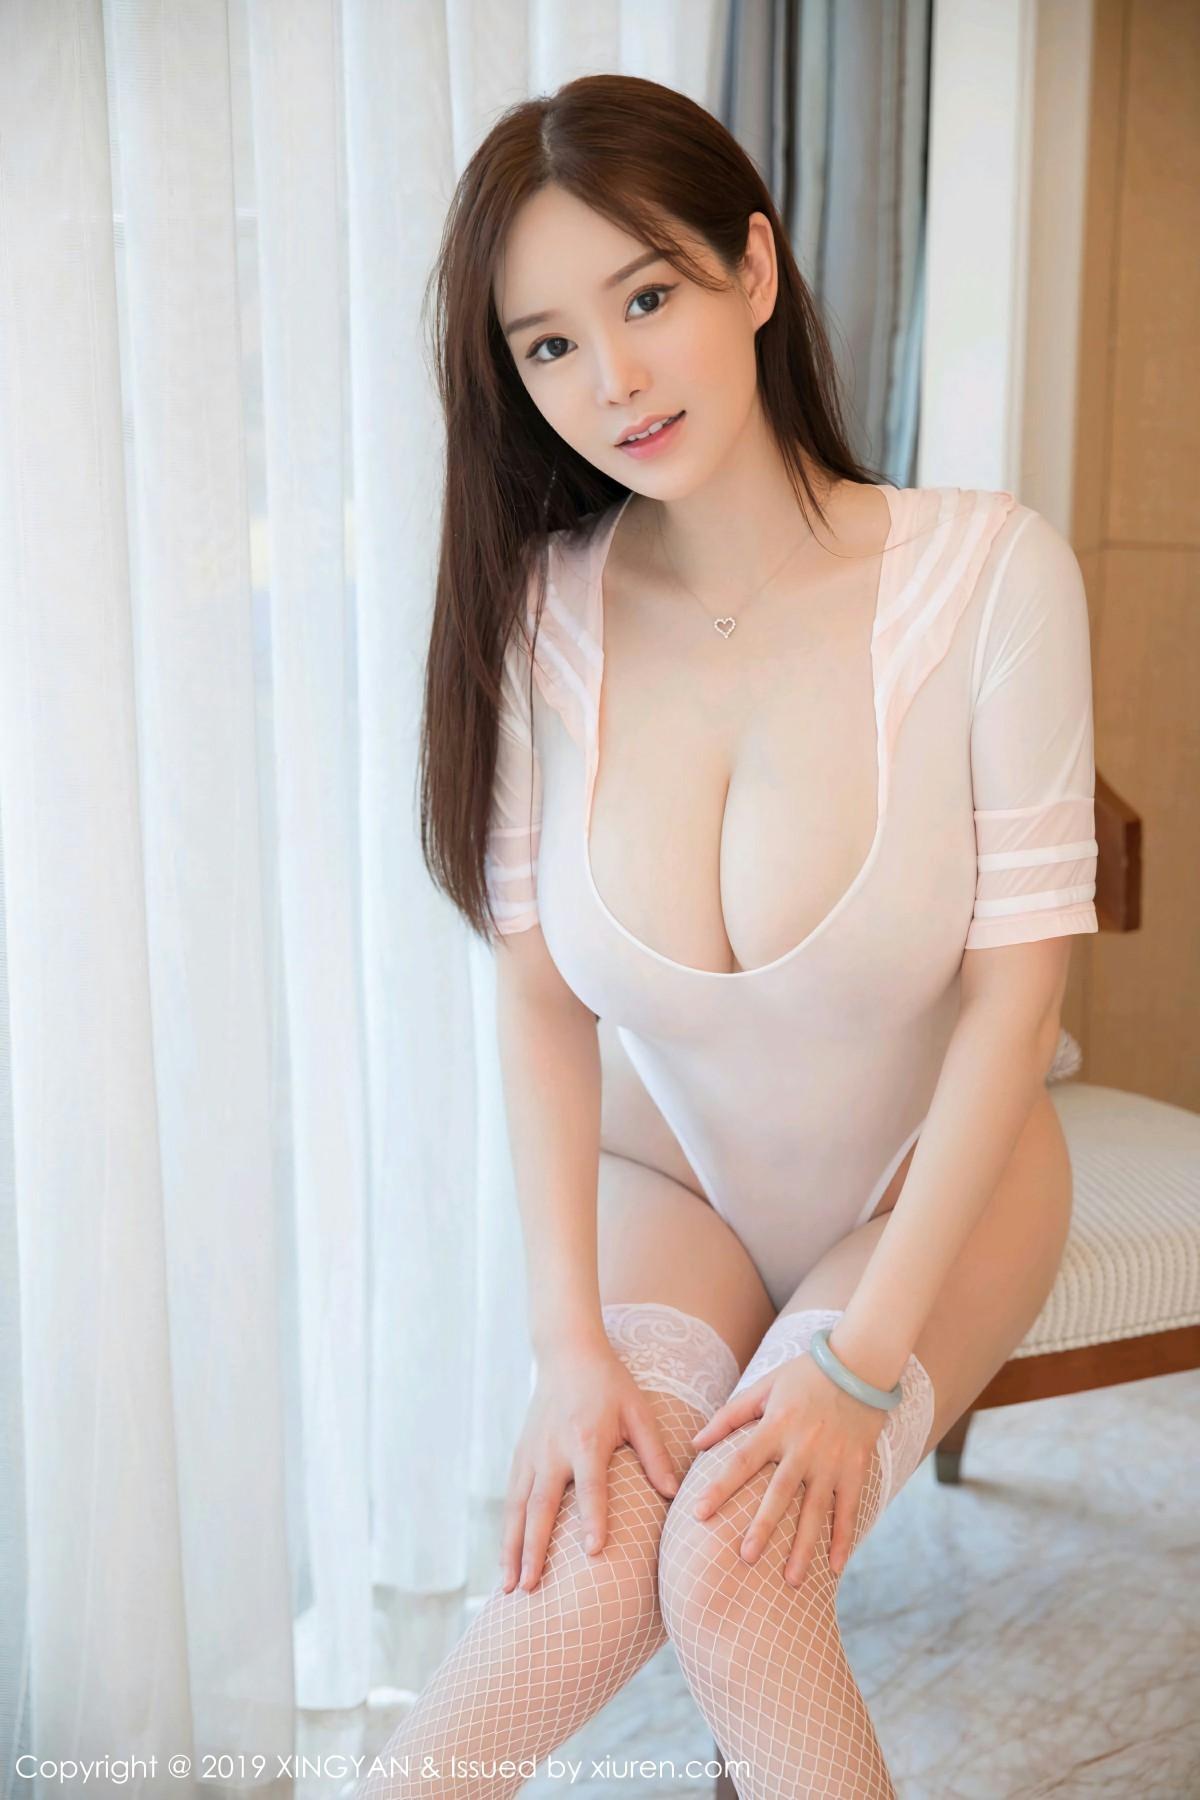 [XINGYAN星颜社]2019.05.13 VOL.120 易阳Silvia [48P] 星颜社 第2张